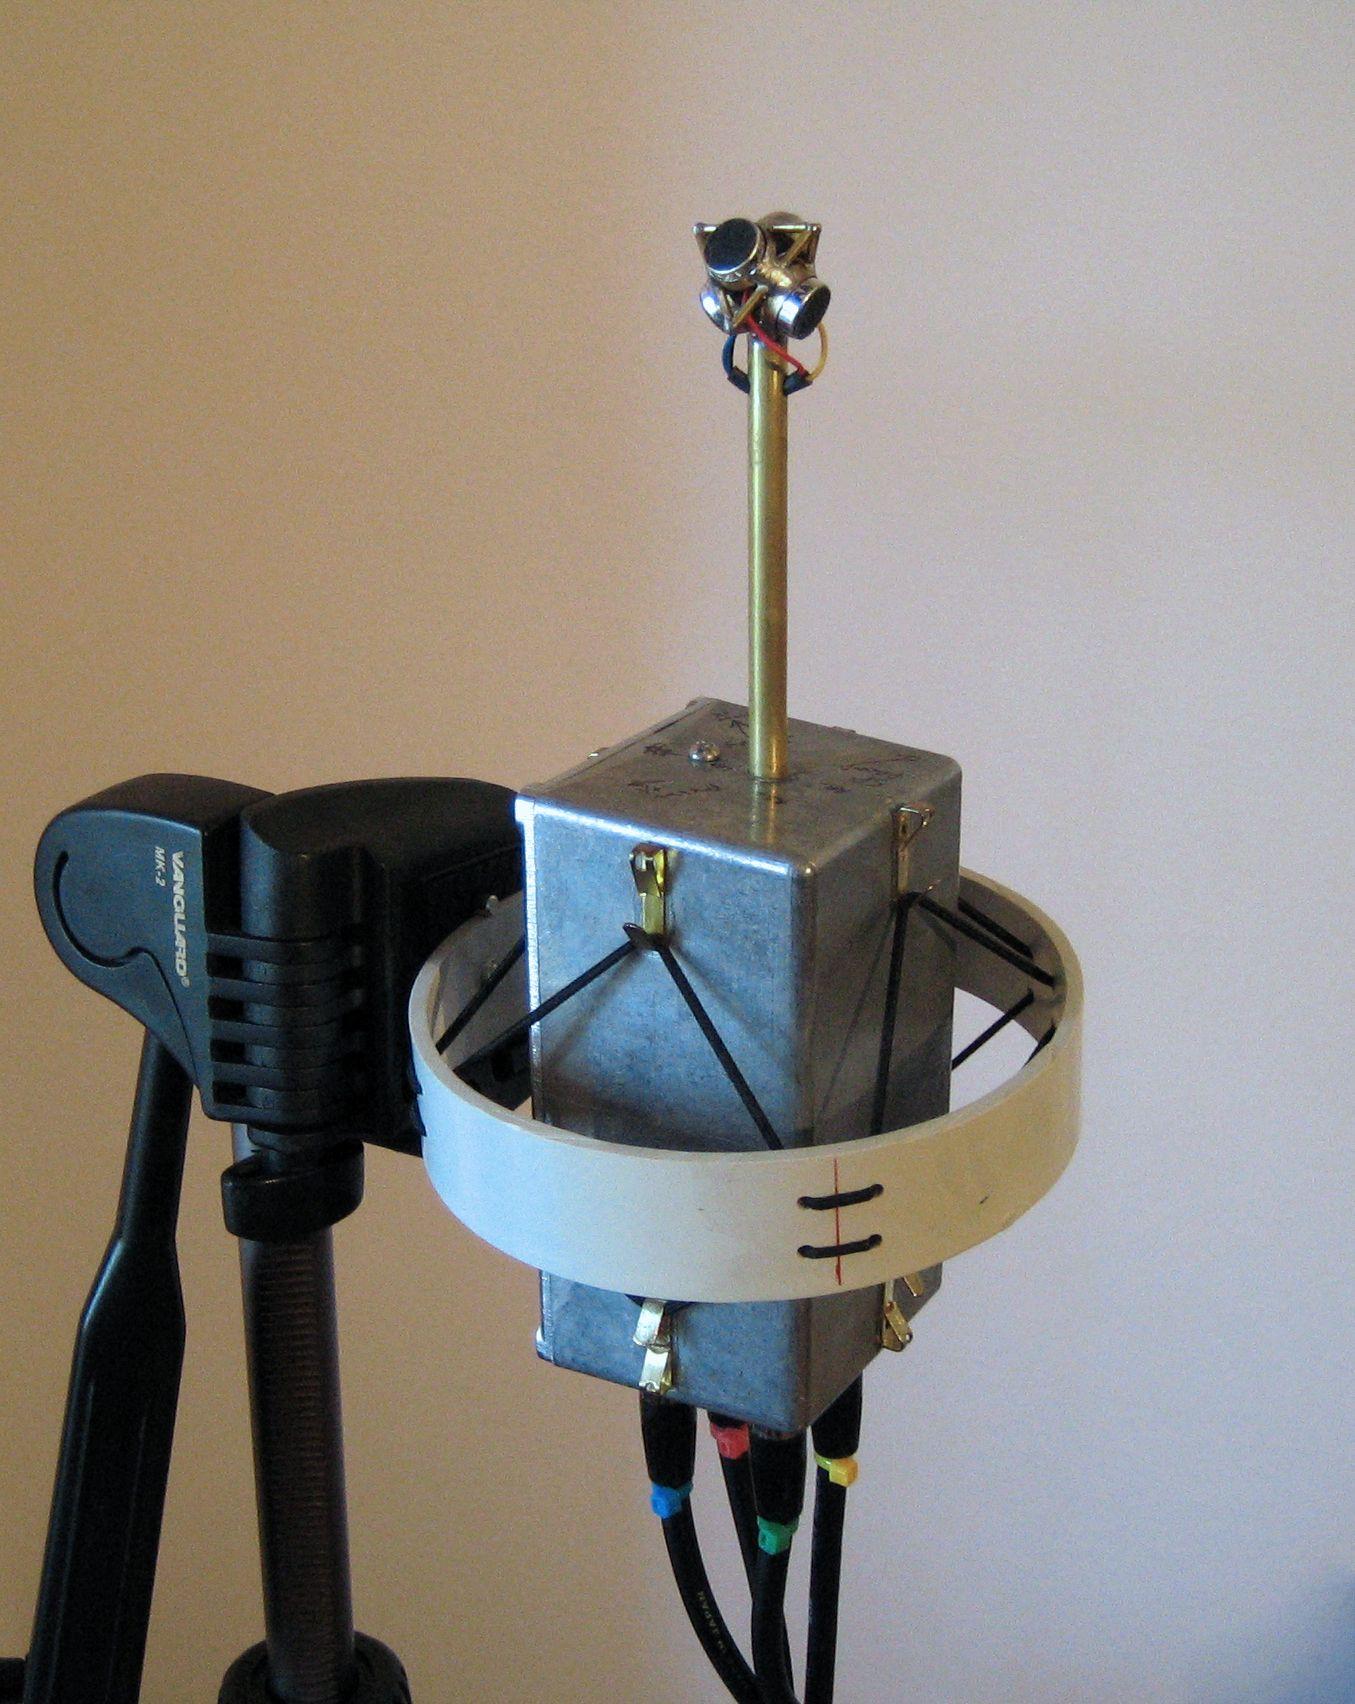 Skema box speaker woofer search results woodworking project ideas - Http Www Soundsorange Net Projects Diy Ambisonic